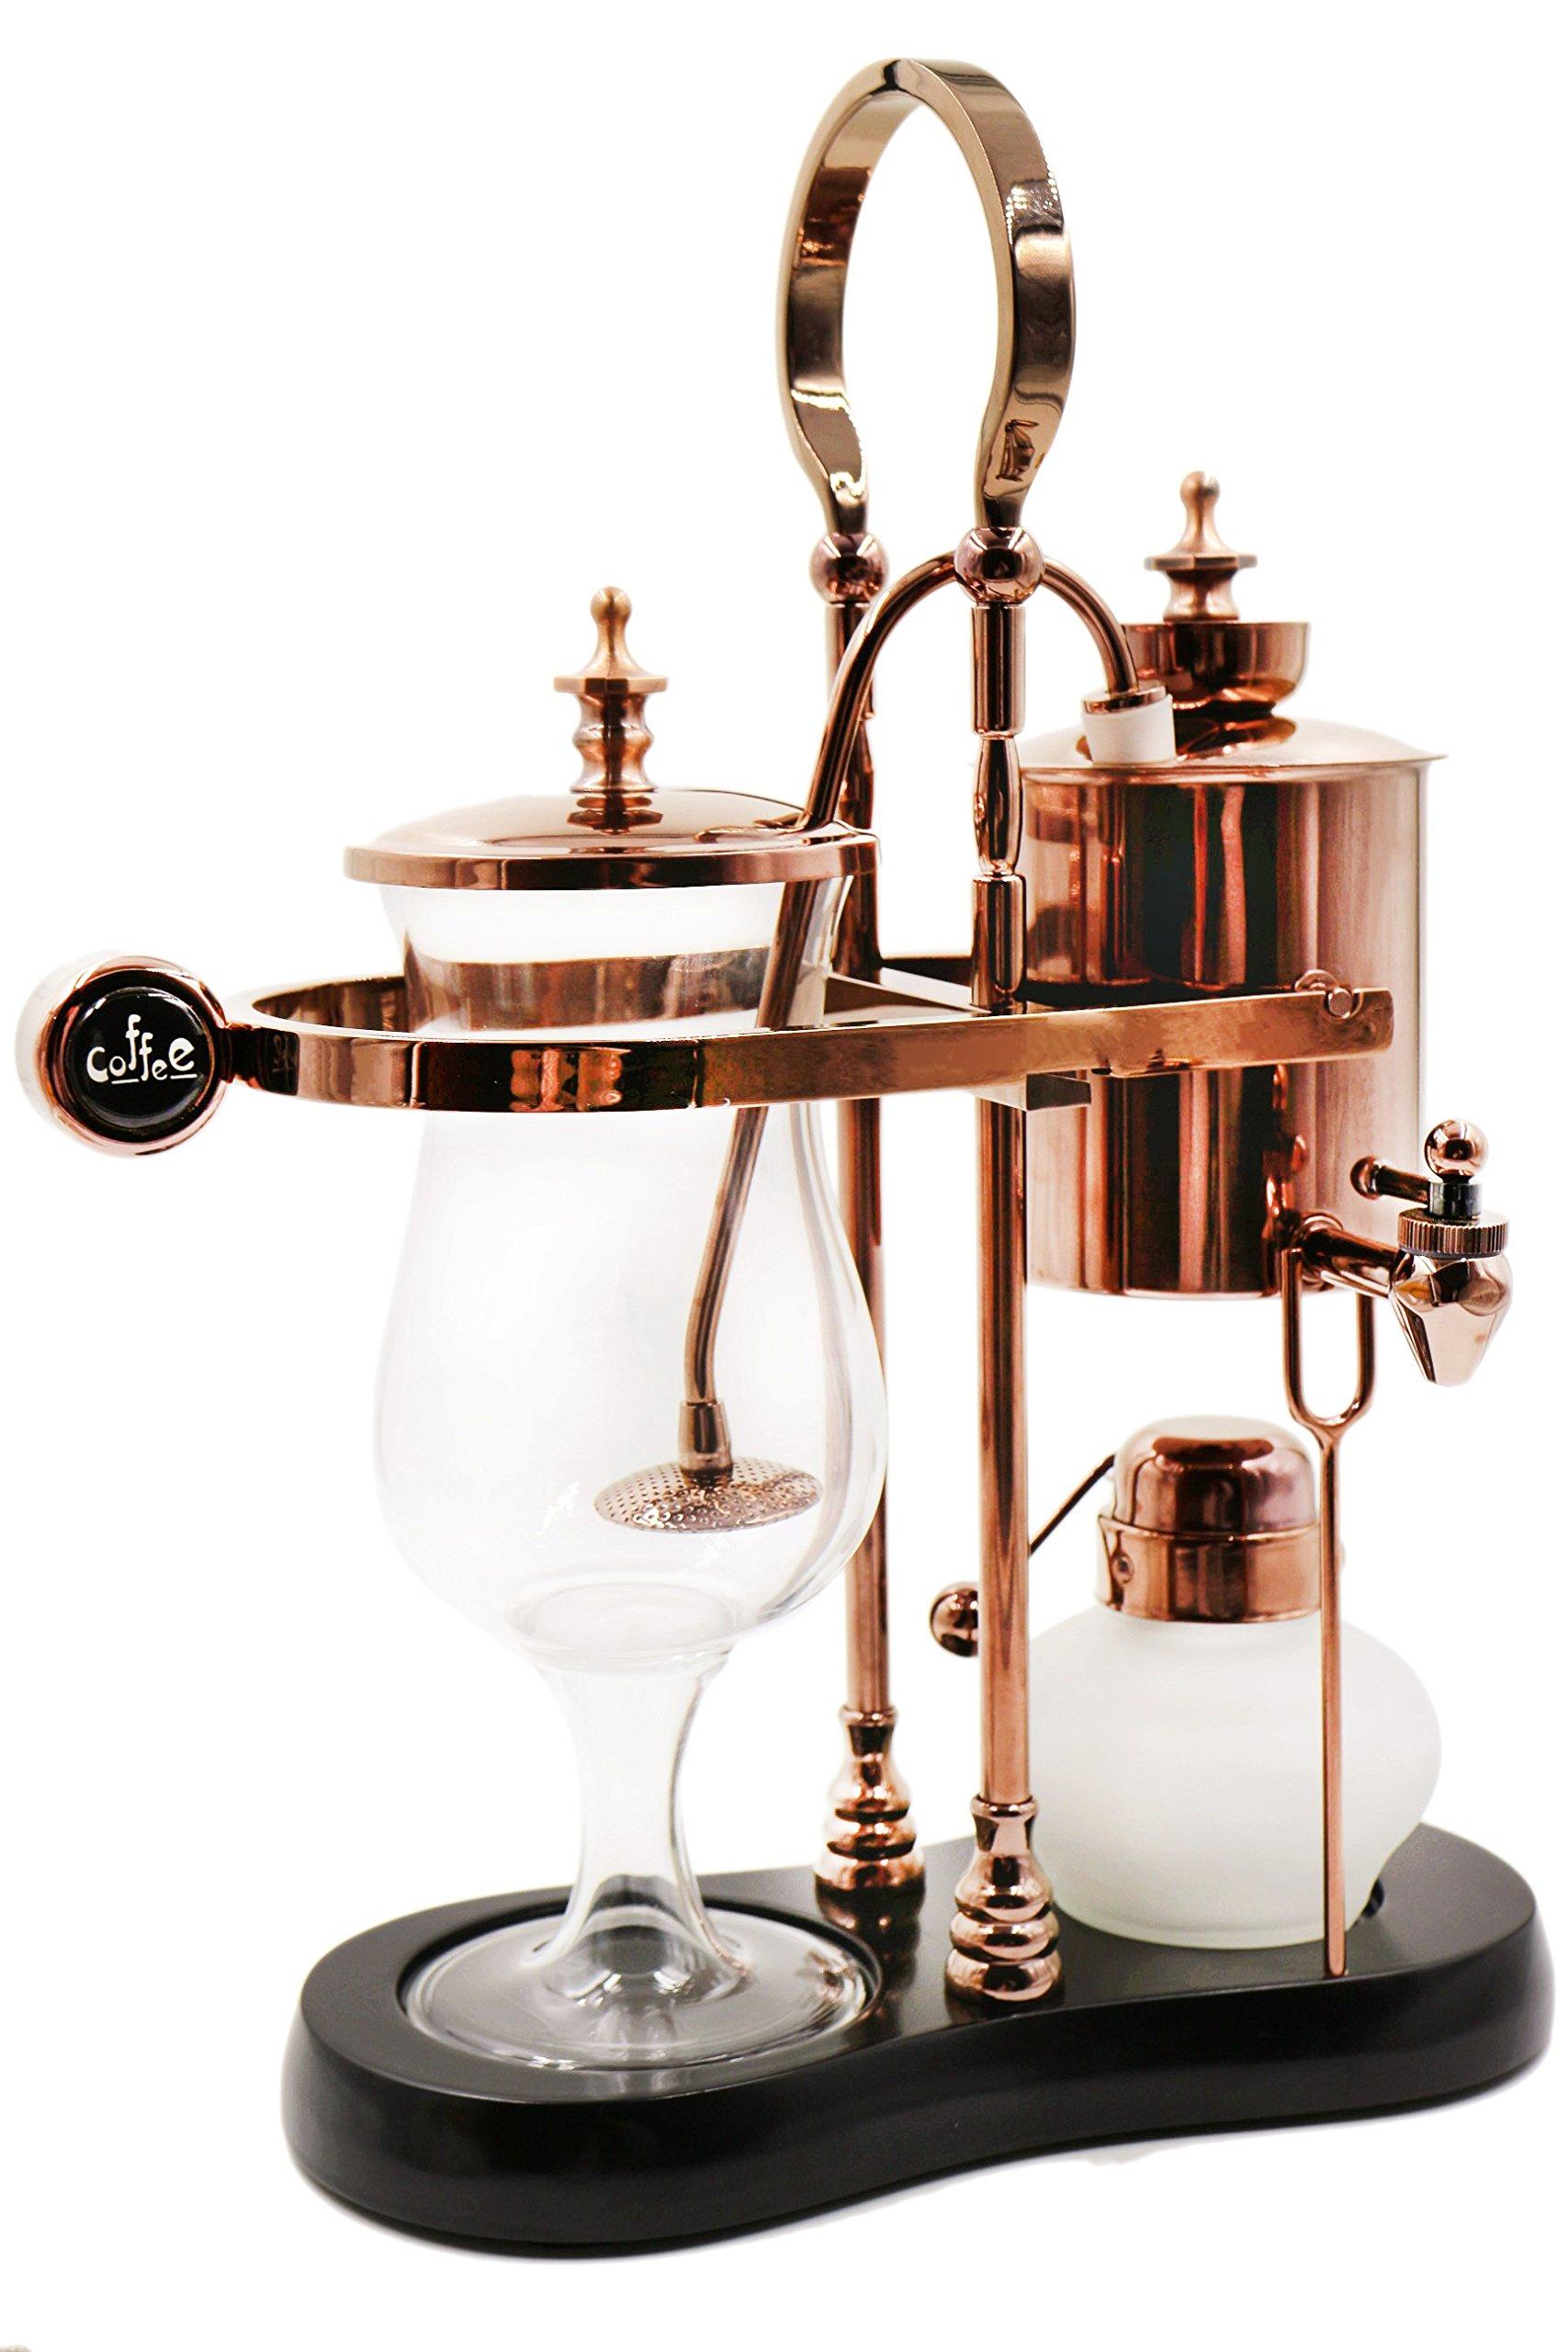 Diguo Belgian / Belgium Luxury Royal Family Balance Syphon Coffee Maker. Elegant Retro-Style Design. Color: Rose Golden. Capacity: 500ml / 17 oz.